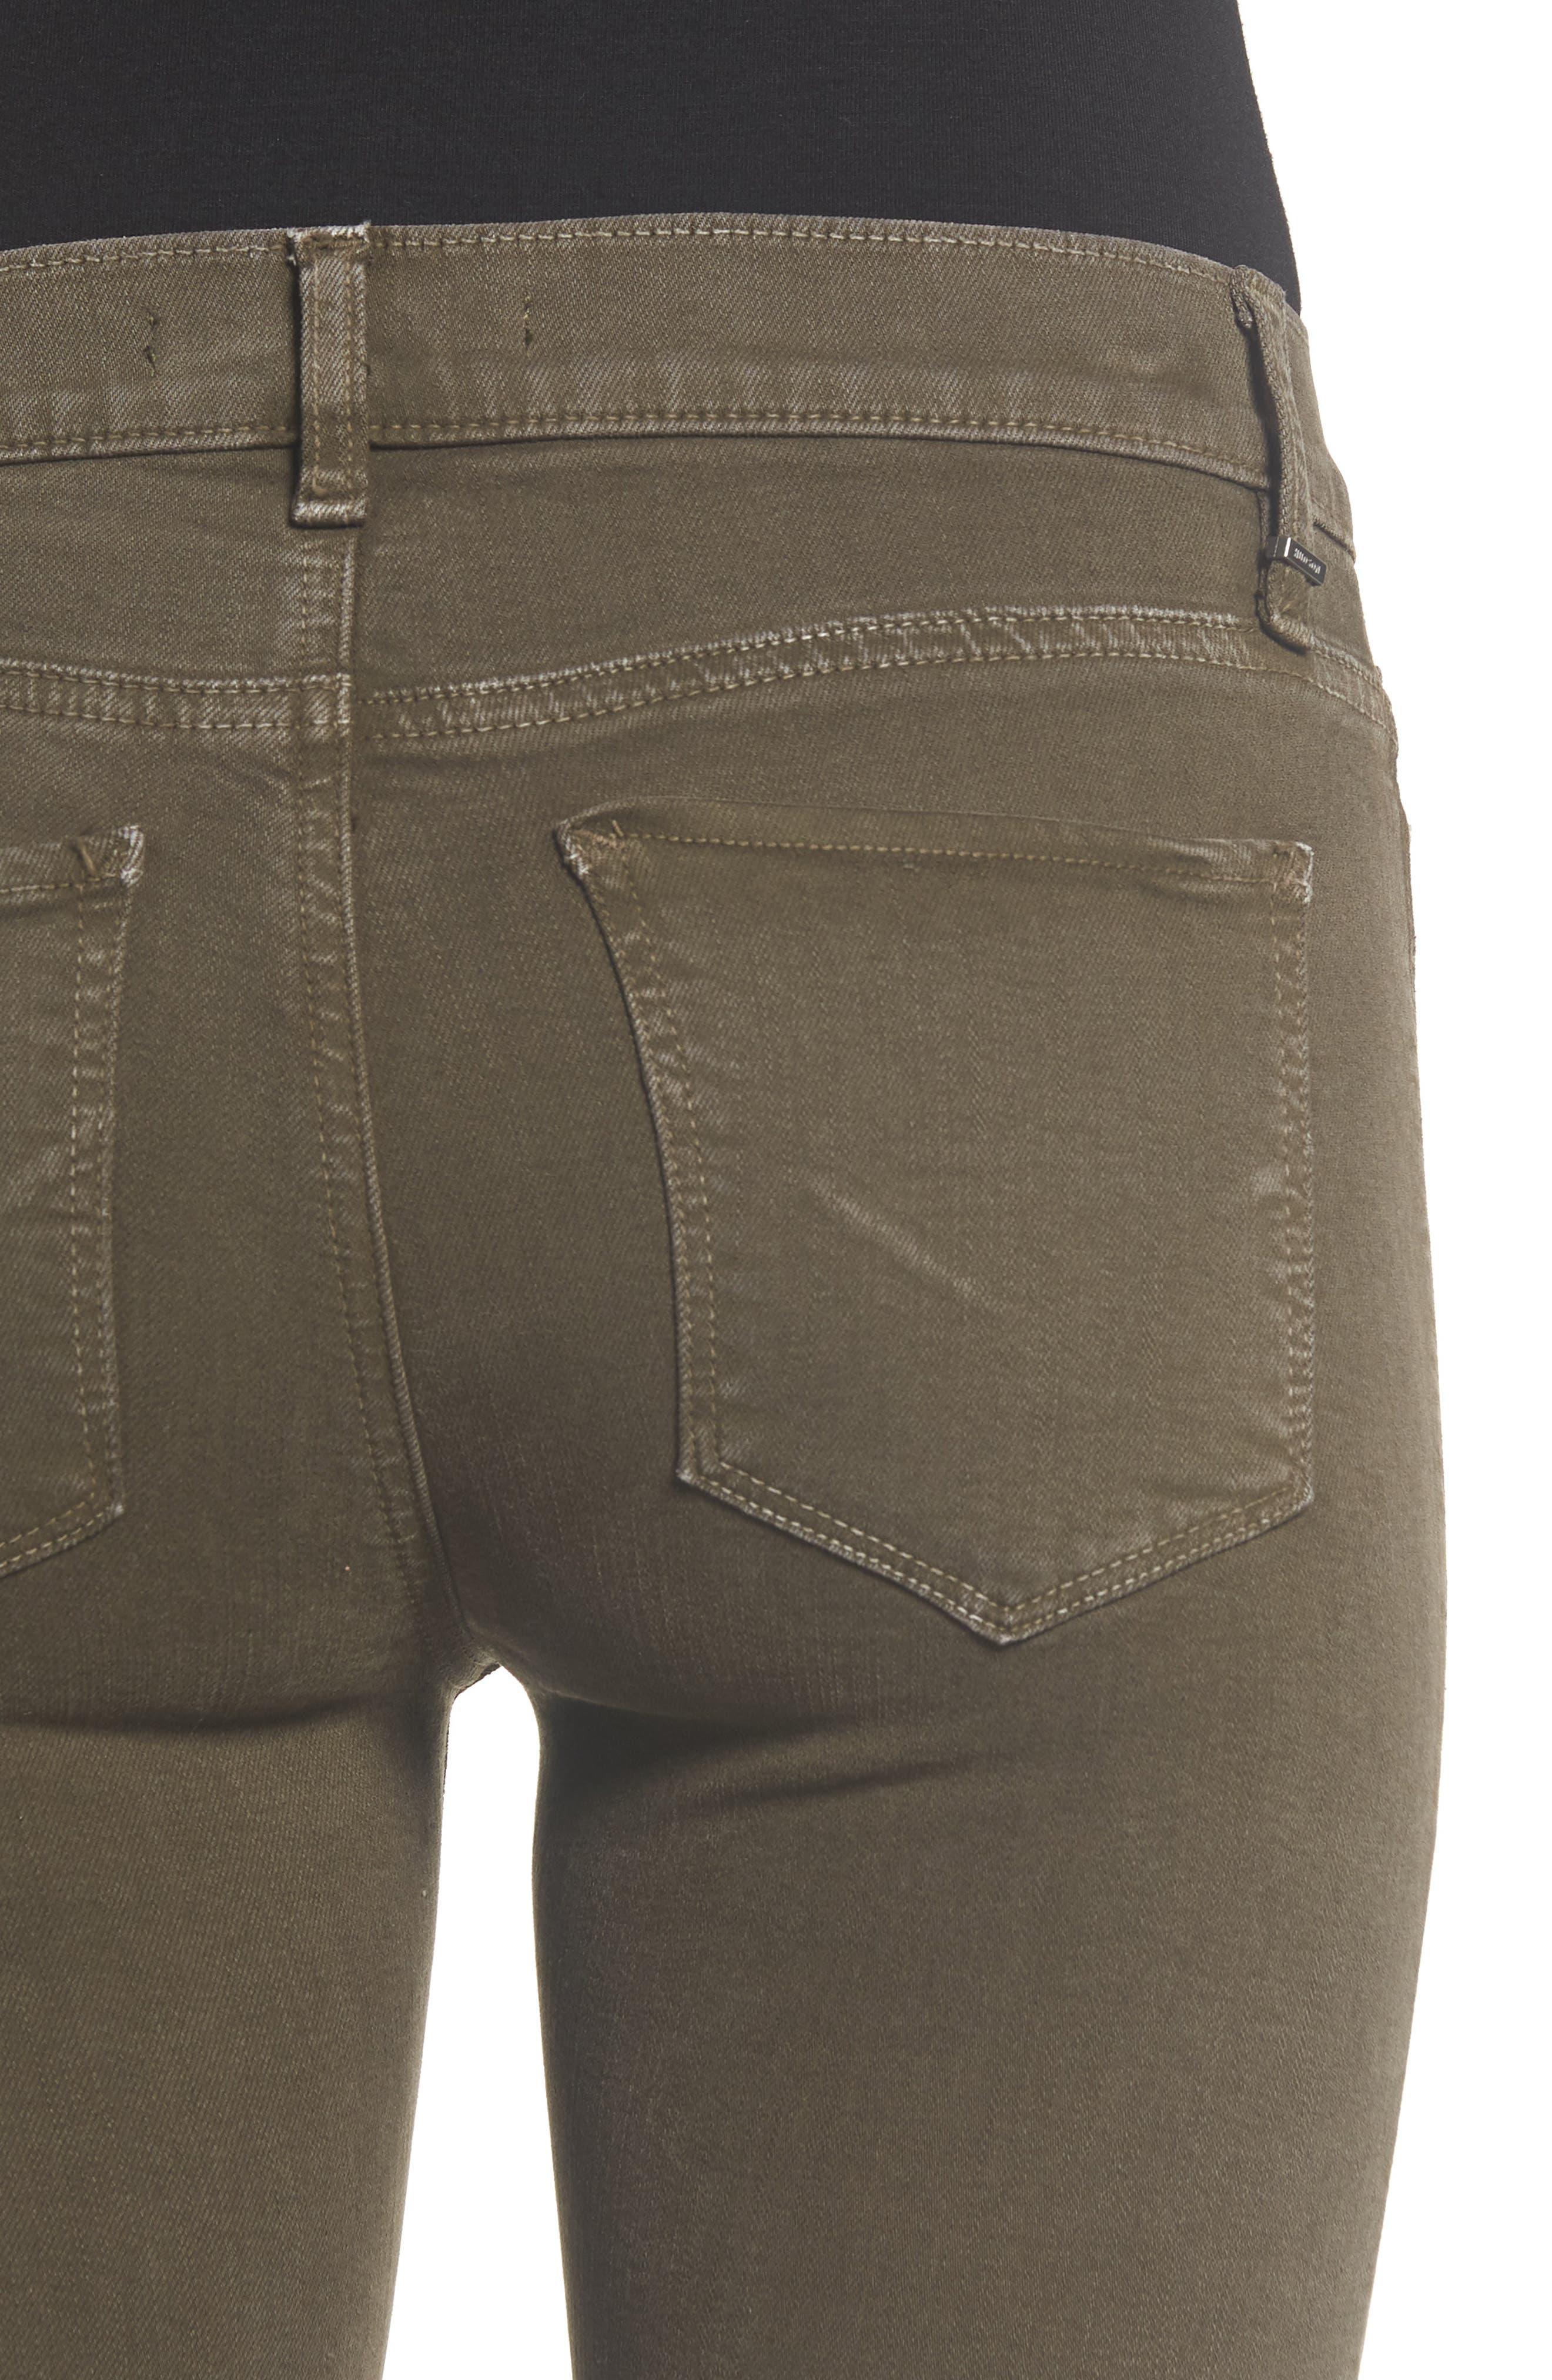 HudsonJeans Nico Super Skinny Jeans,                             Alternate thumbnail 4, color,                             DISTRESSED DARK FORESTER